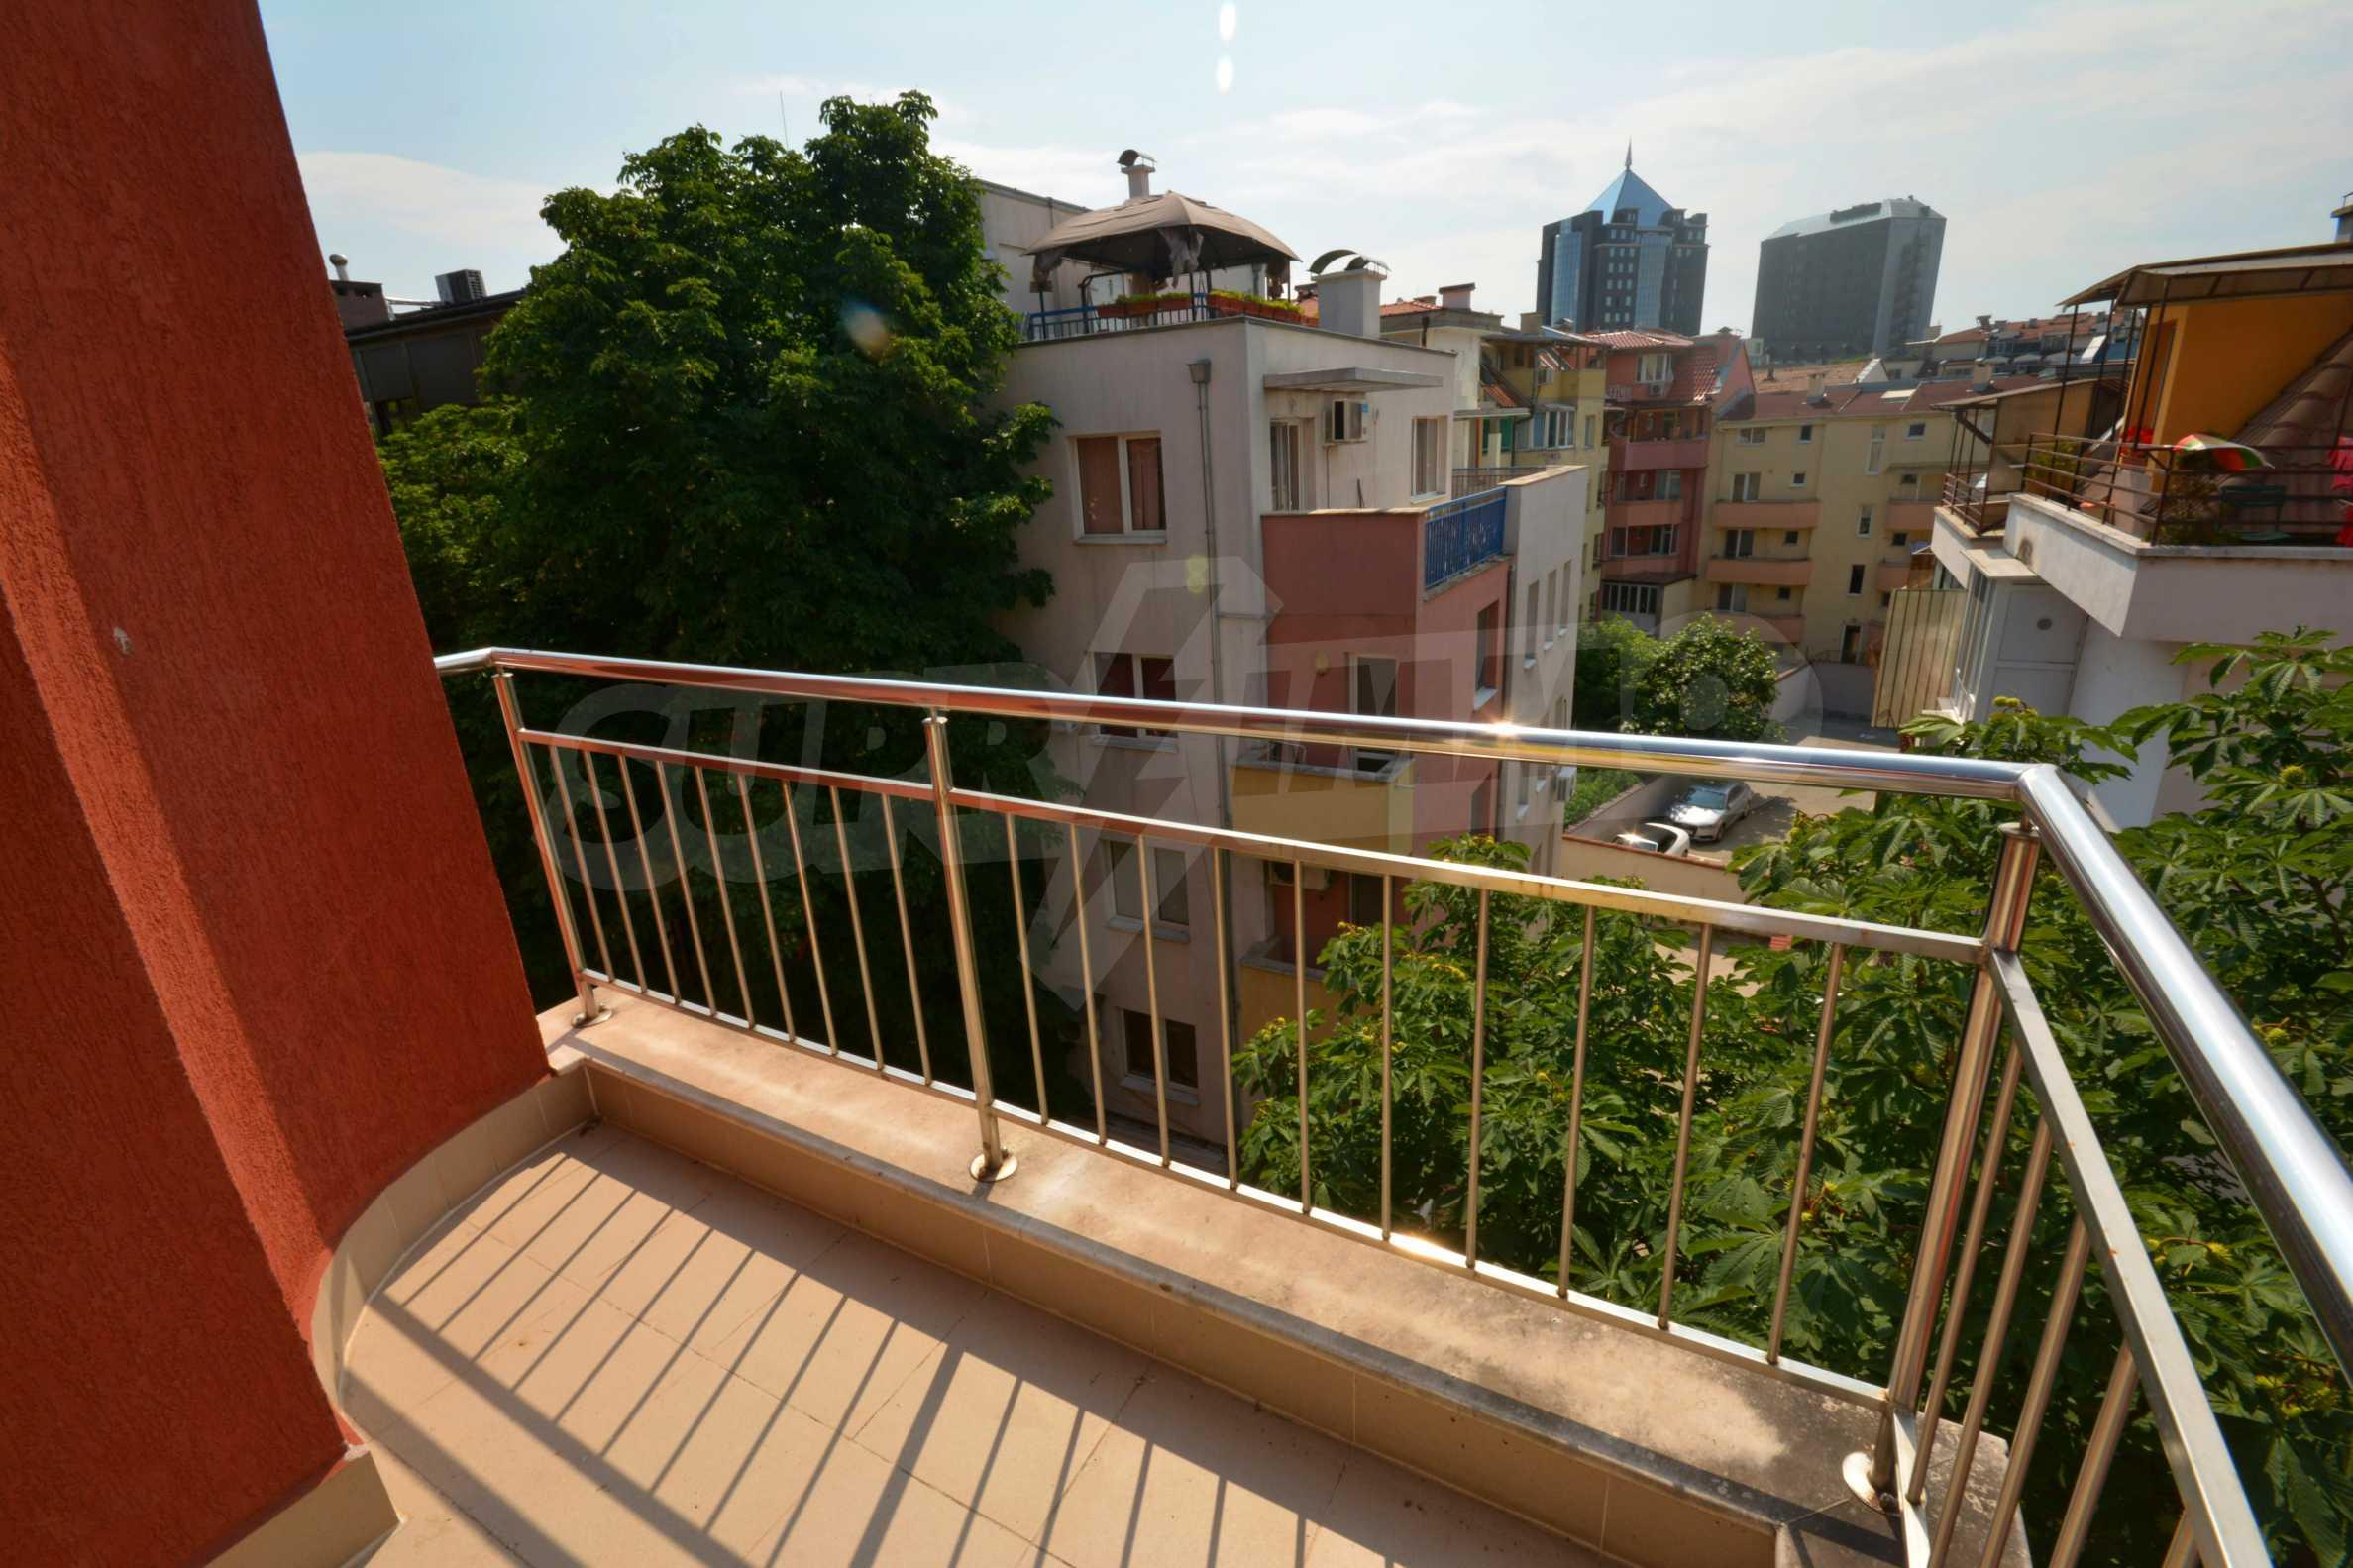 Многостаен апартамент до Гранд Хотел Пловдив 16